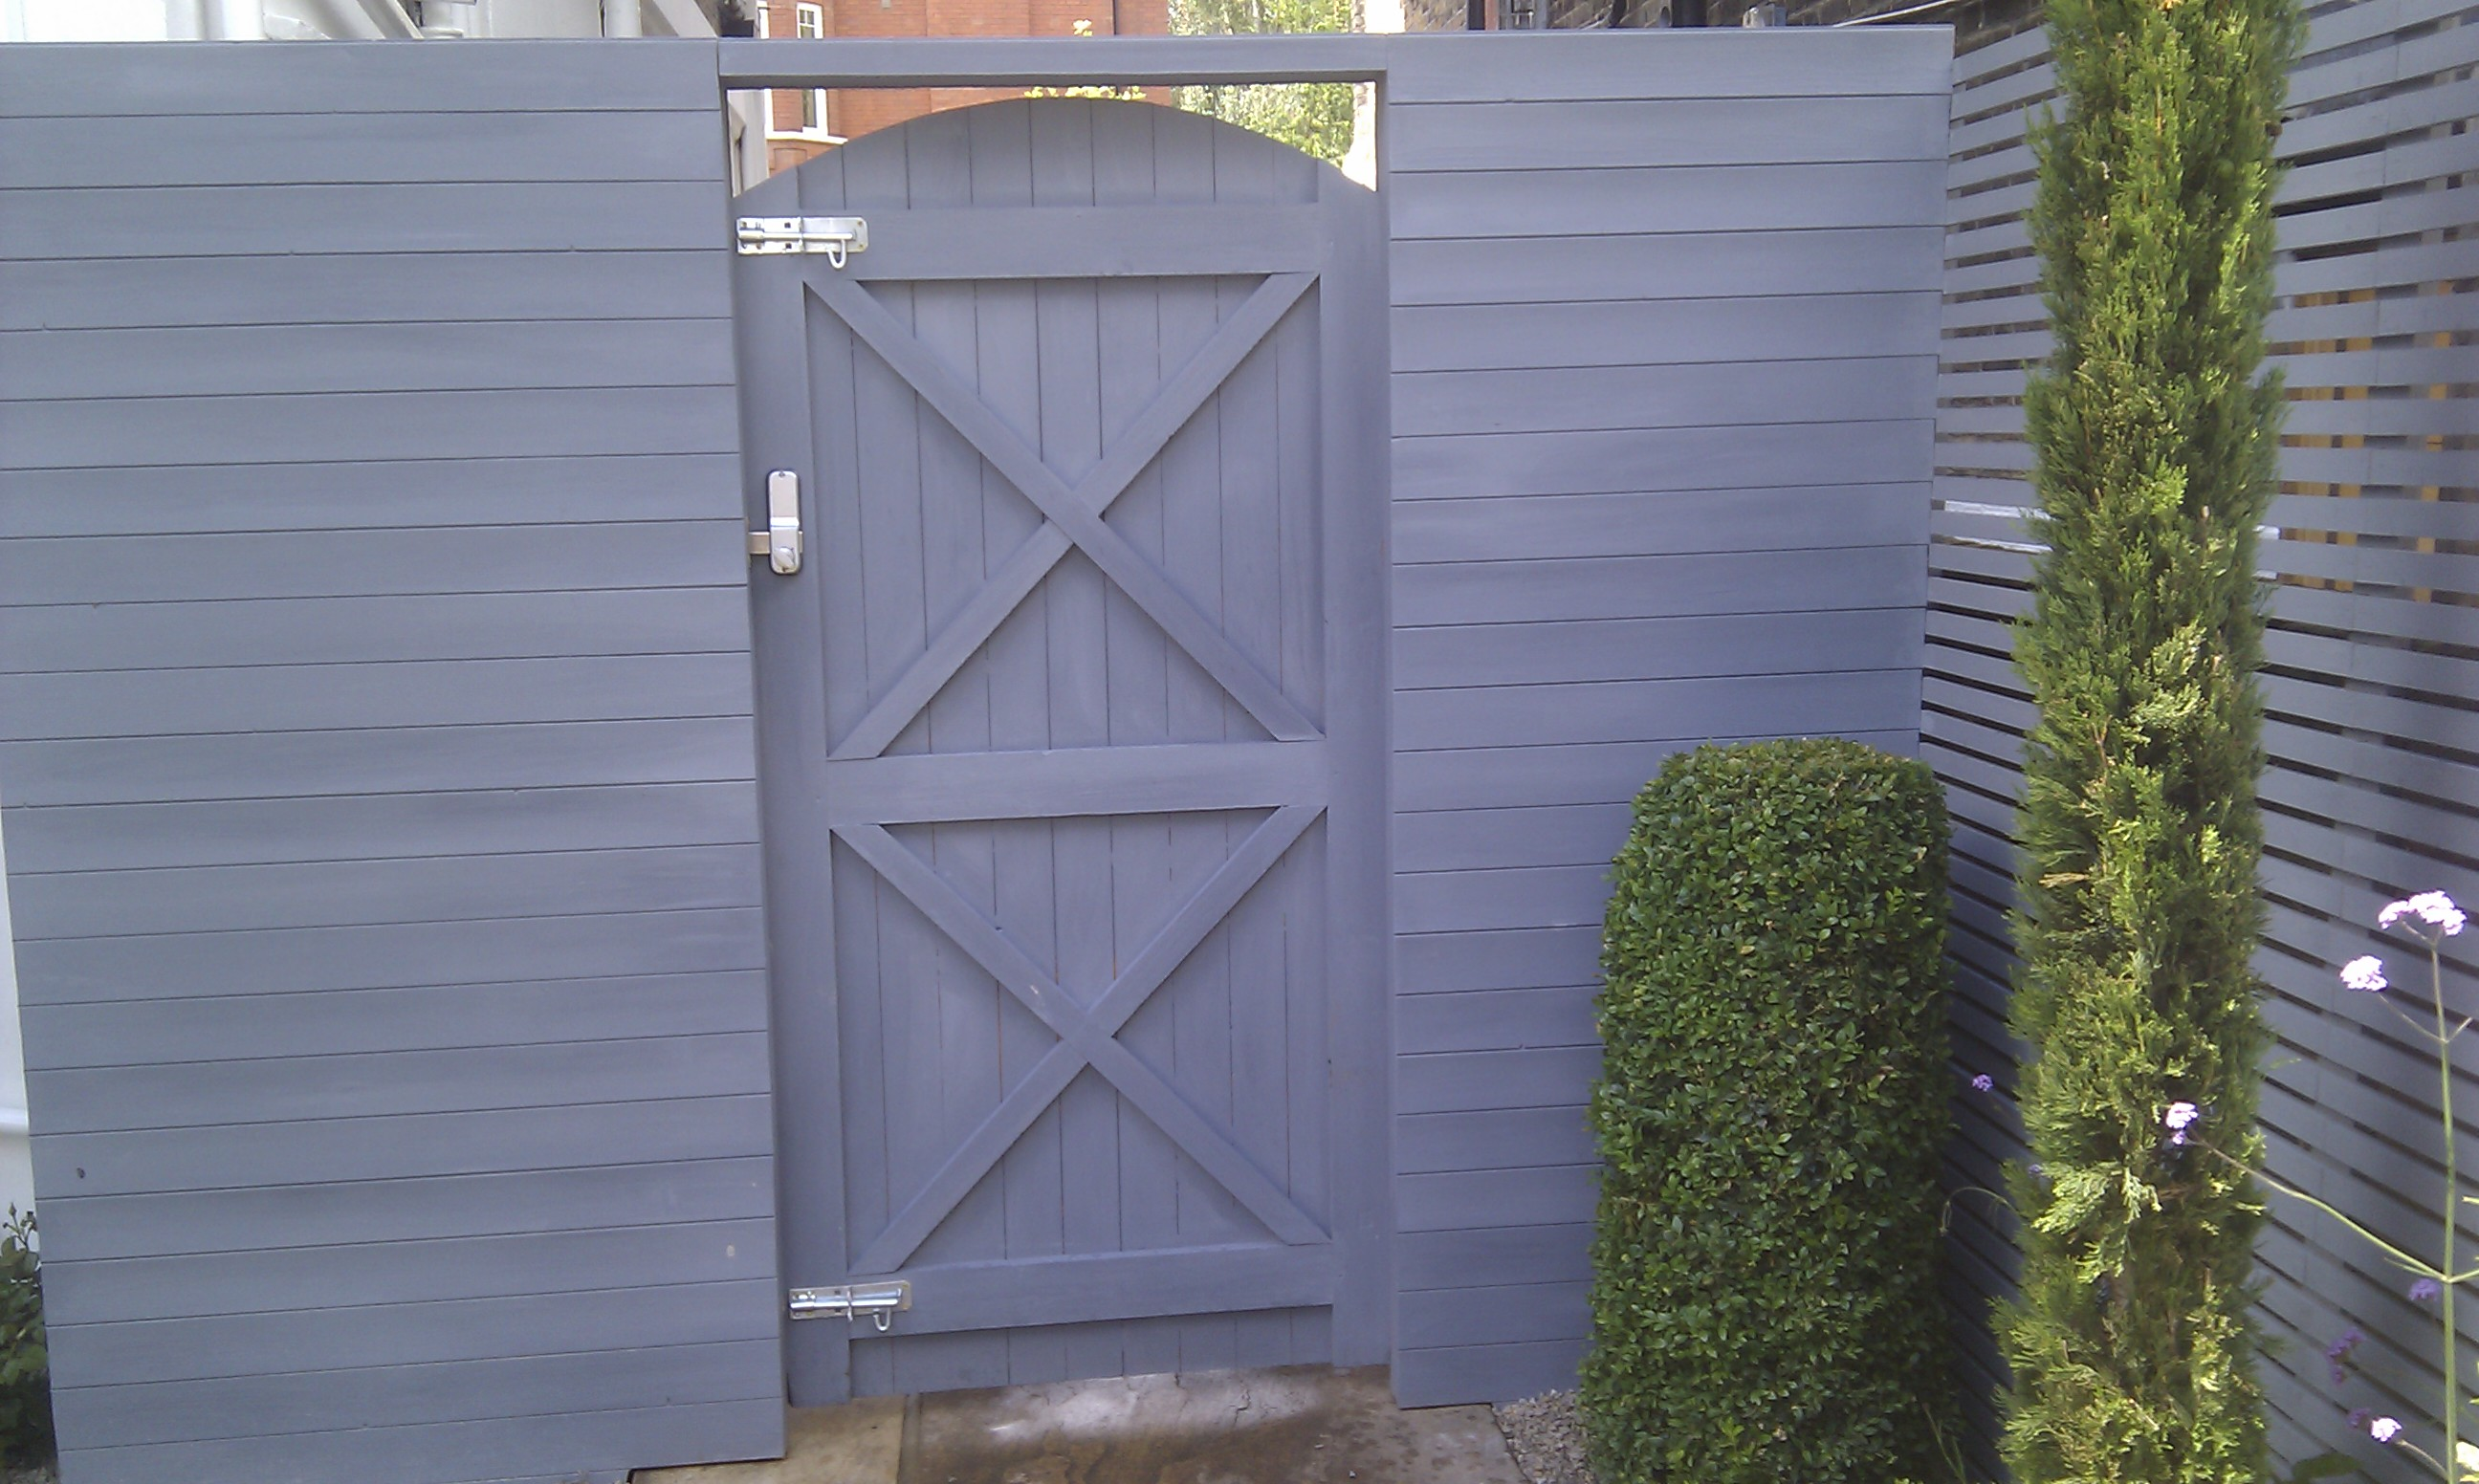 modern garden design london slatted grey privacy screen sandstone paving easy grass balau hardwood decking (6)